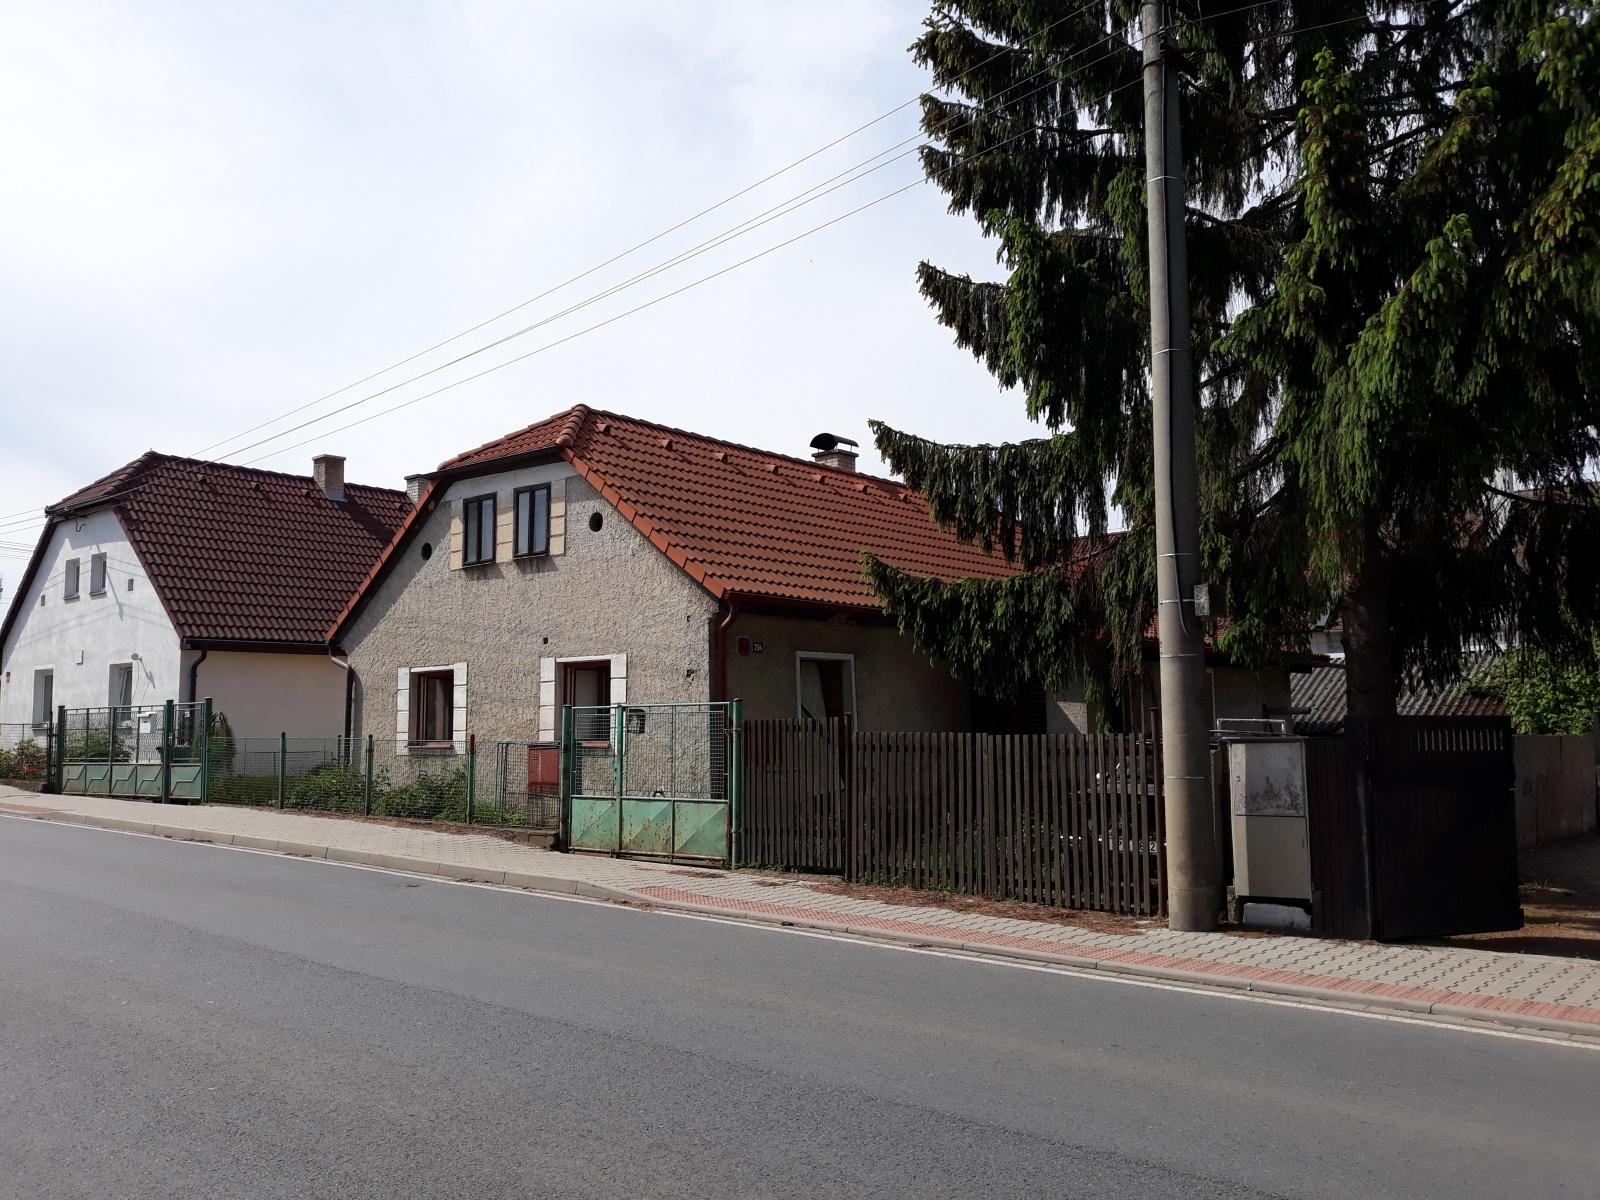 Prodej, rodinný dům, obec Břasy, Rokycany